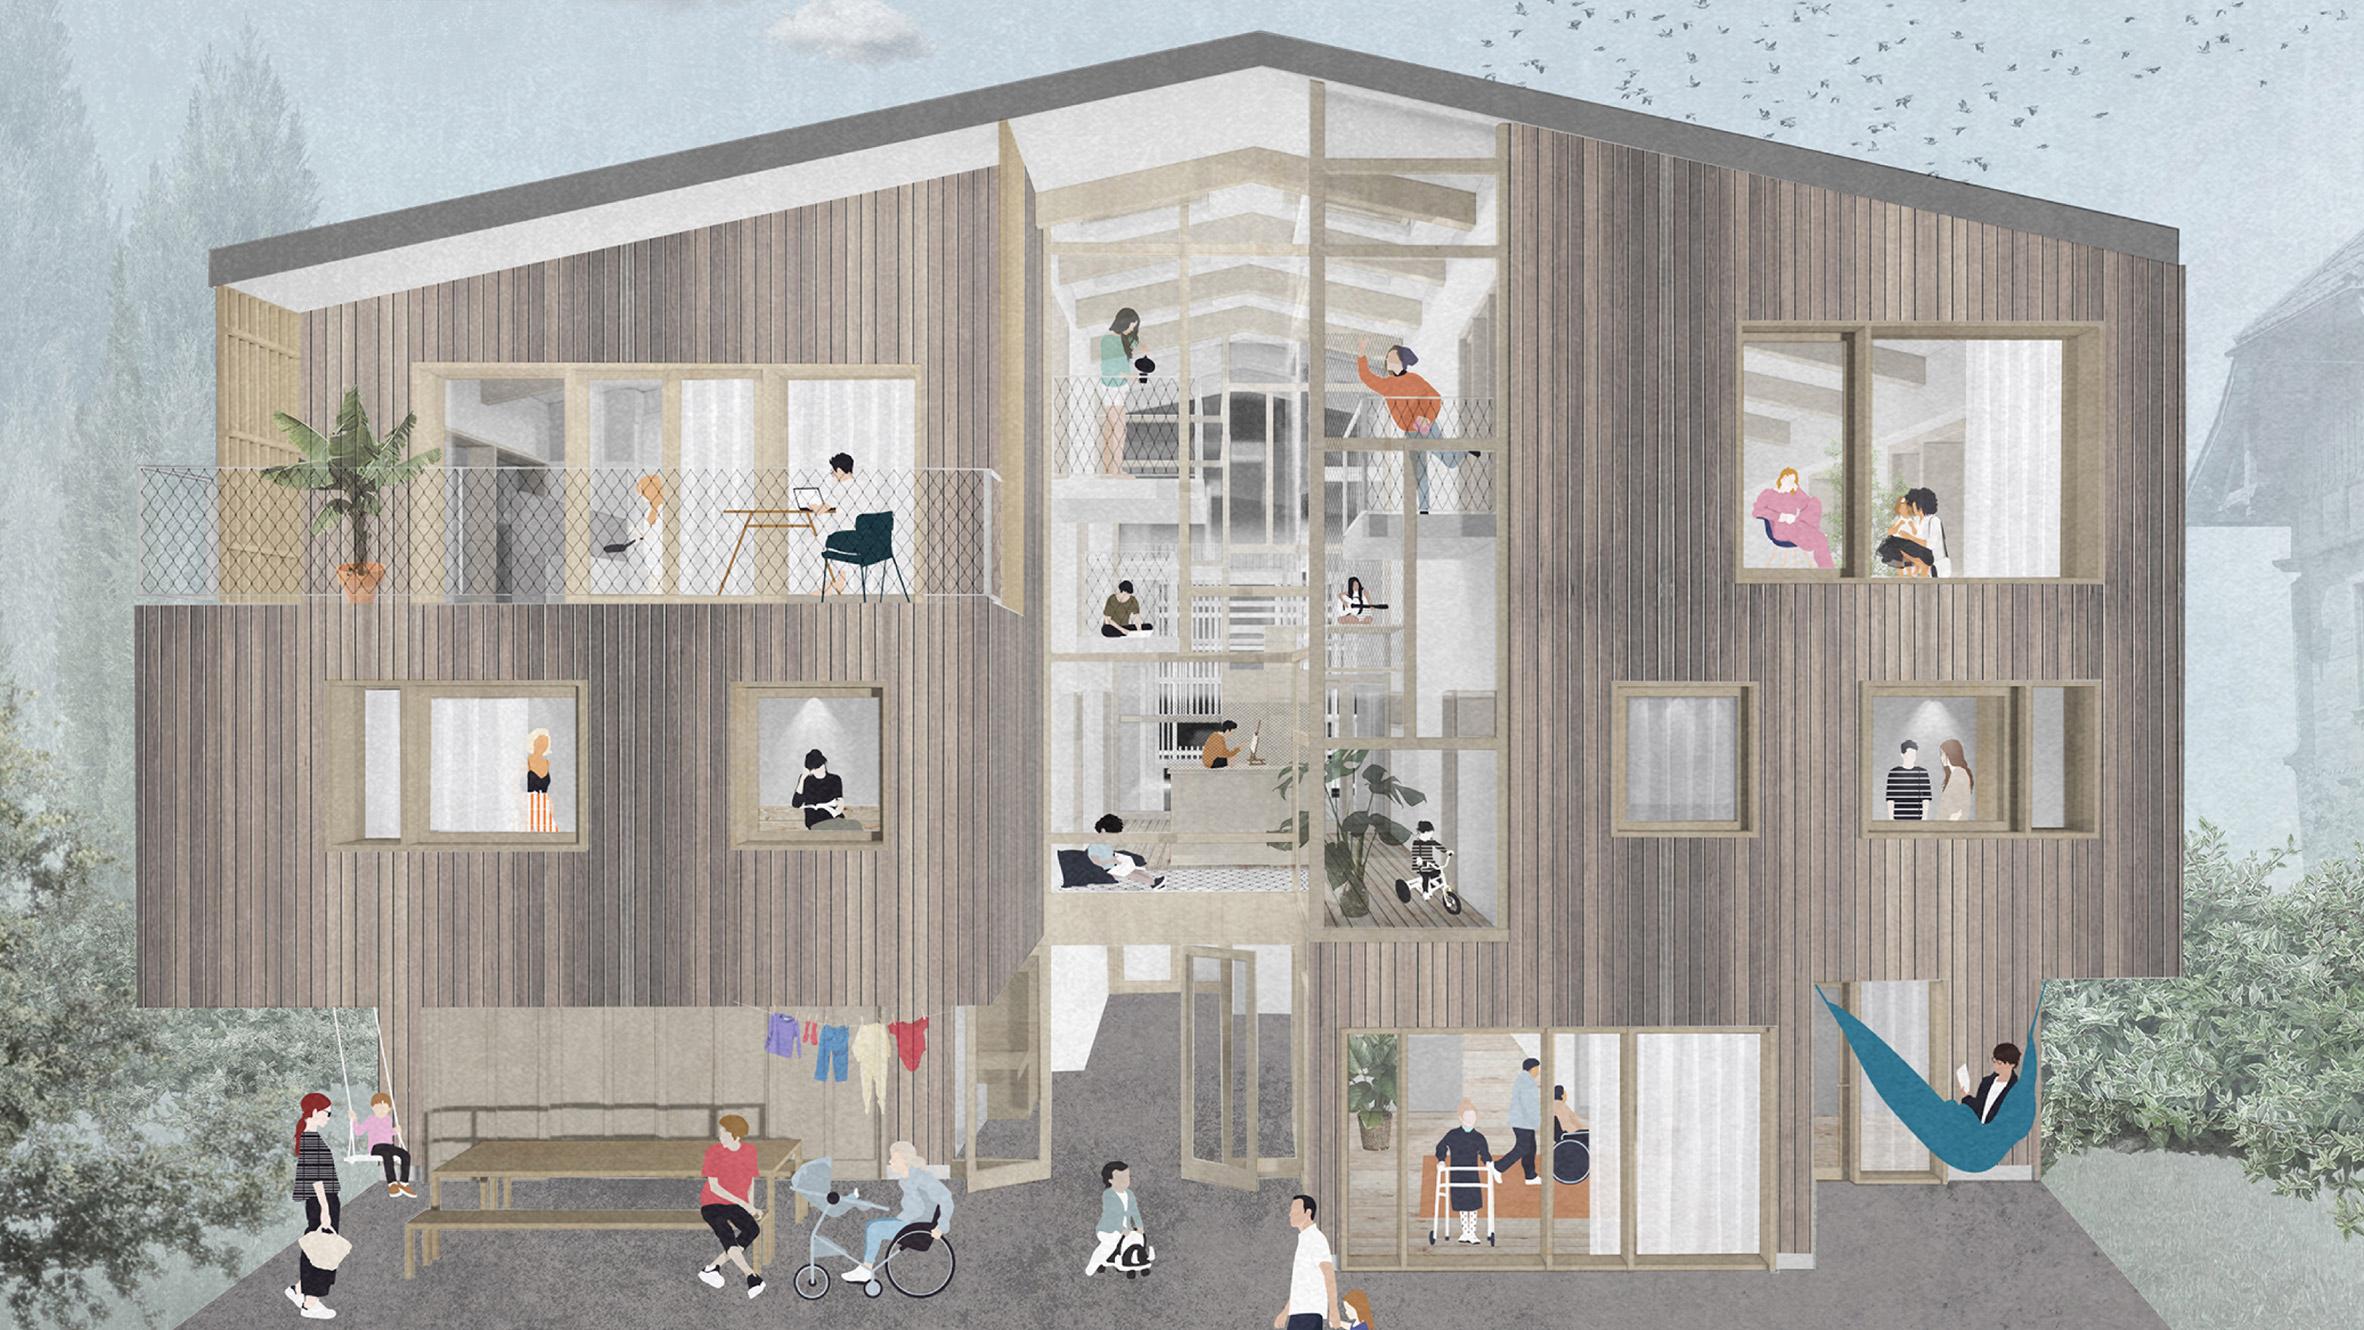 Mehrhaus by Anna Wieser